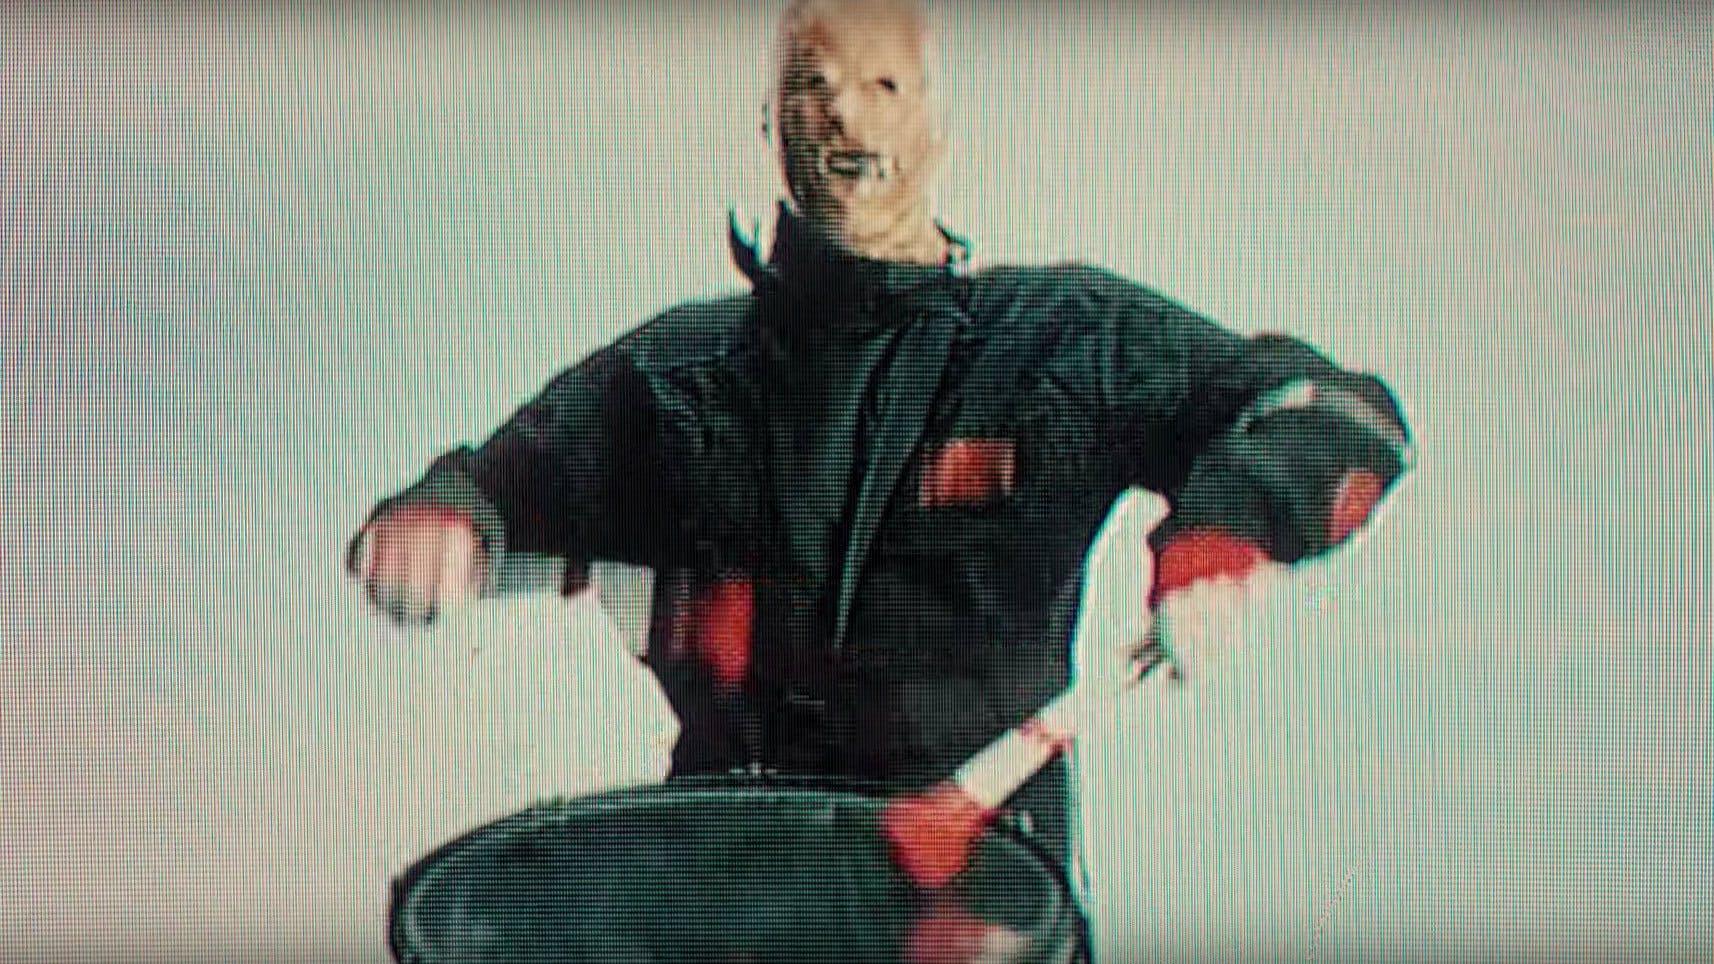 Slipknot Unsainted video grab